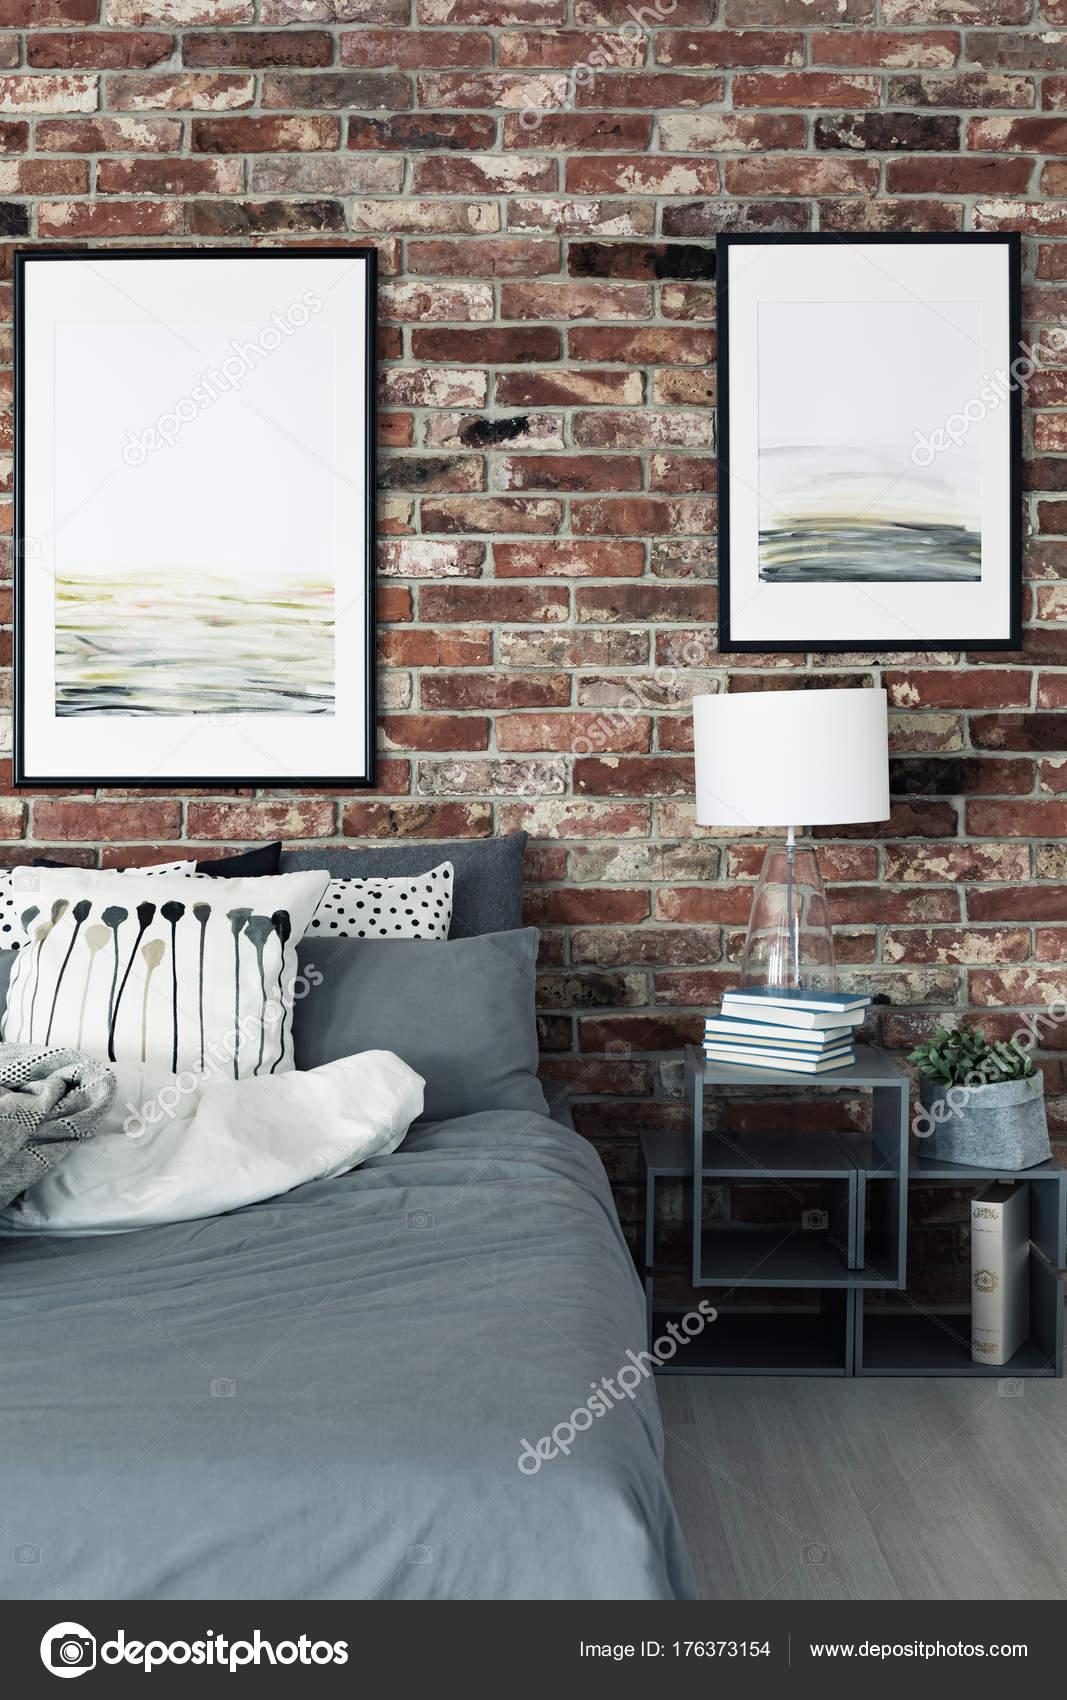 schilderijen in moderne slaapkamer interieur stockfoto